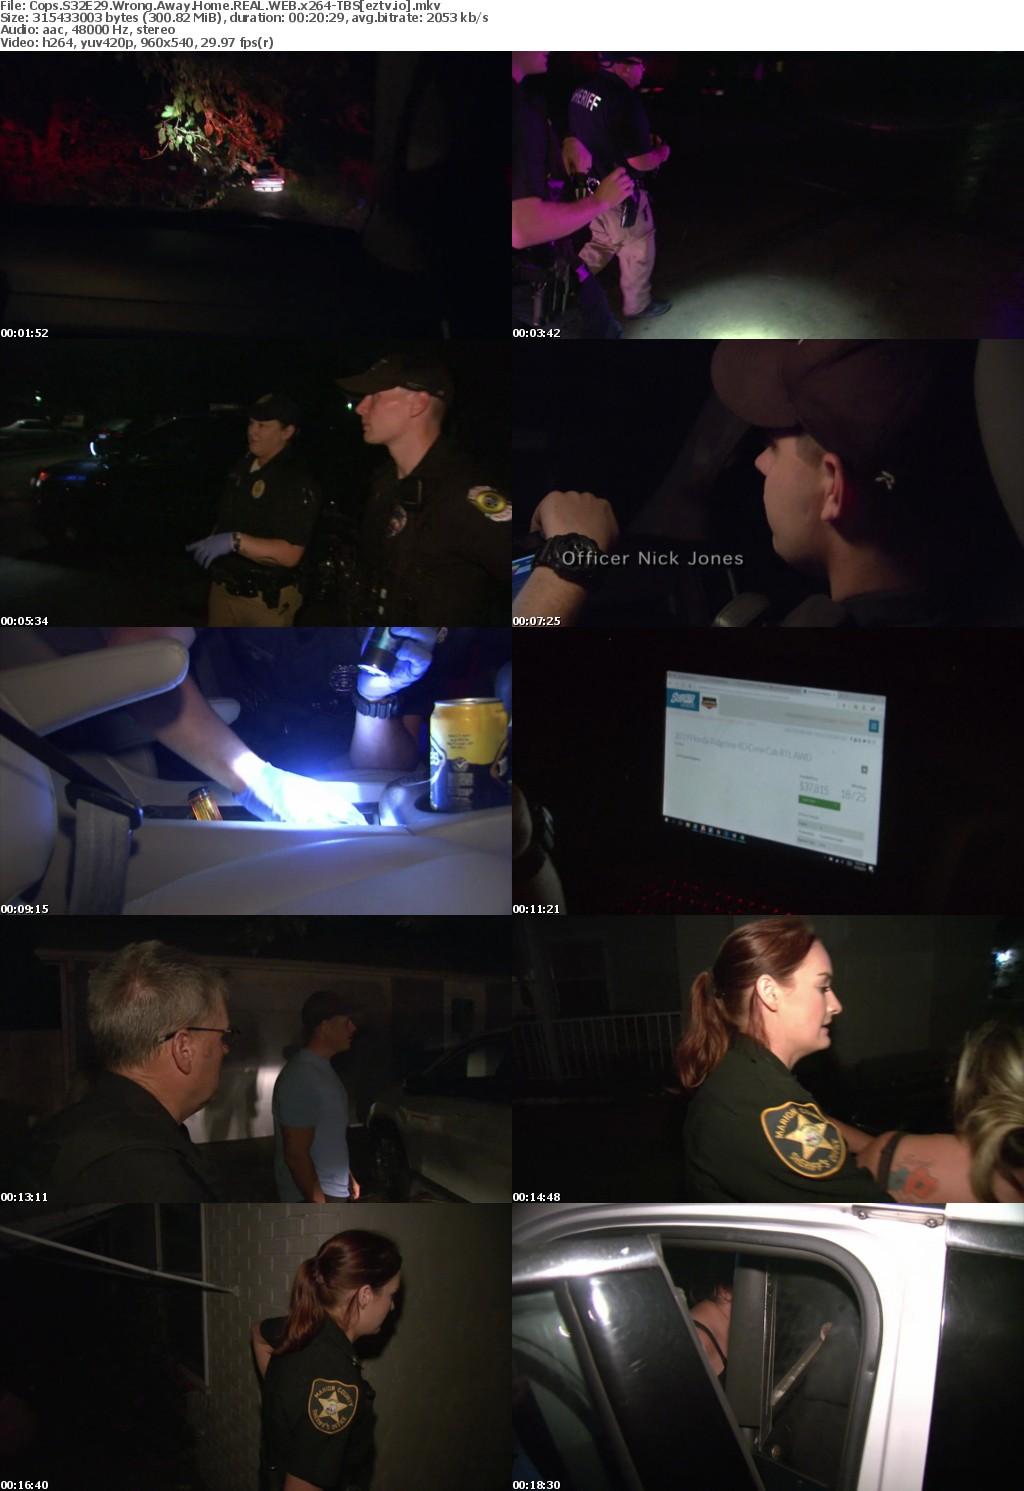 Cops S32E29 Wrong Away Home REAL WEB x264-TBS